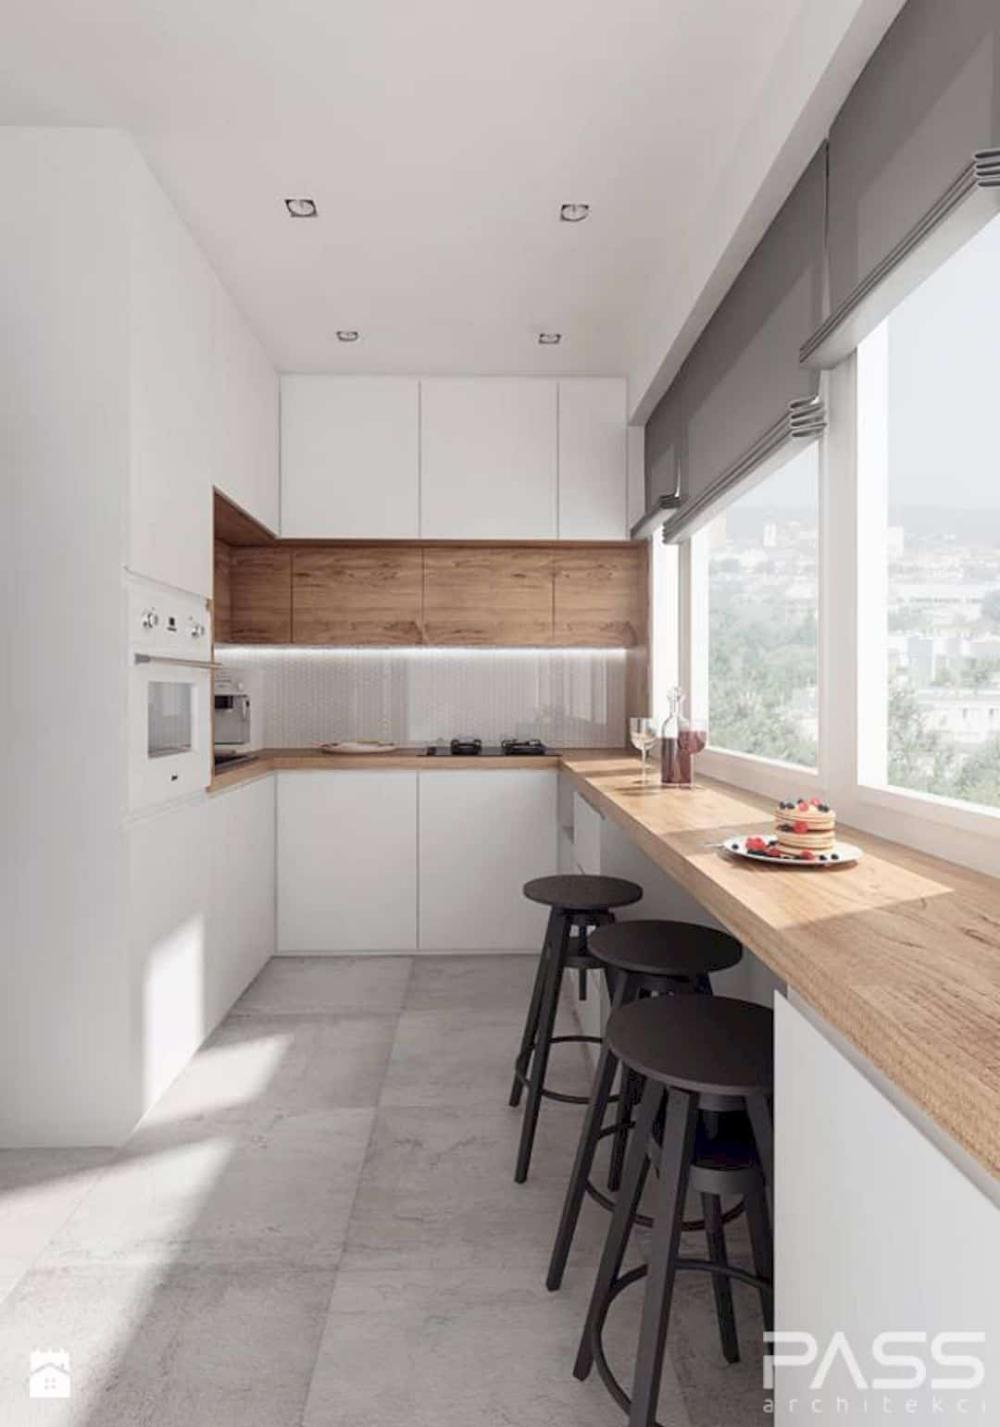 A Guide To Efficient Small Kitchen Design For Apartment Modern Kitchen Design Scandinavian Kitchen Design Interior Design Kitchen